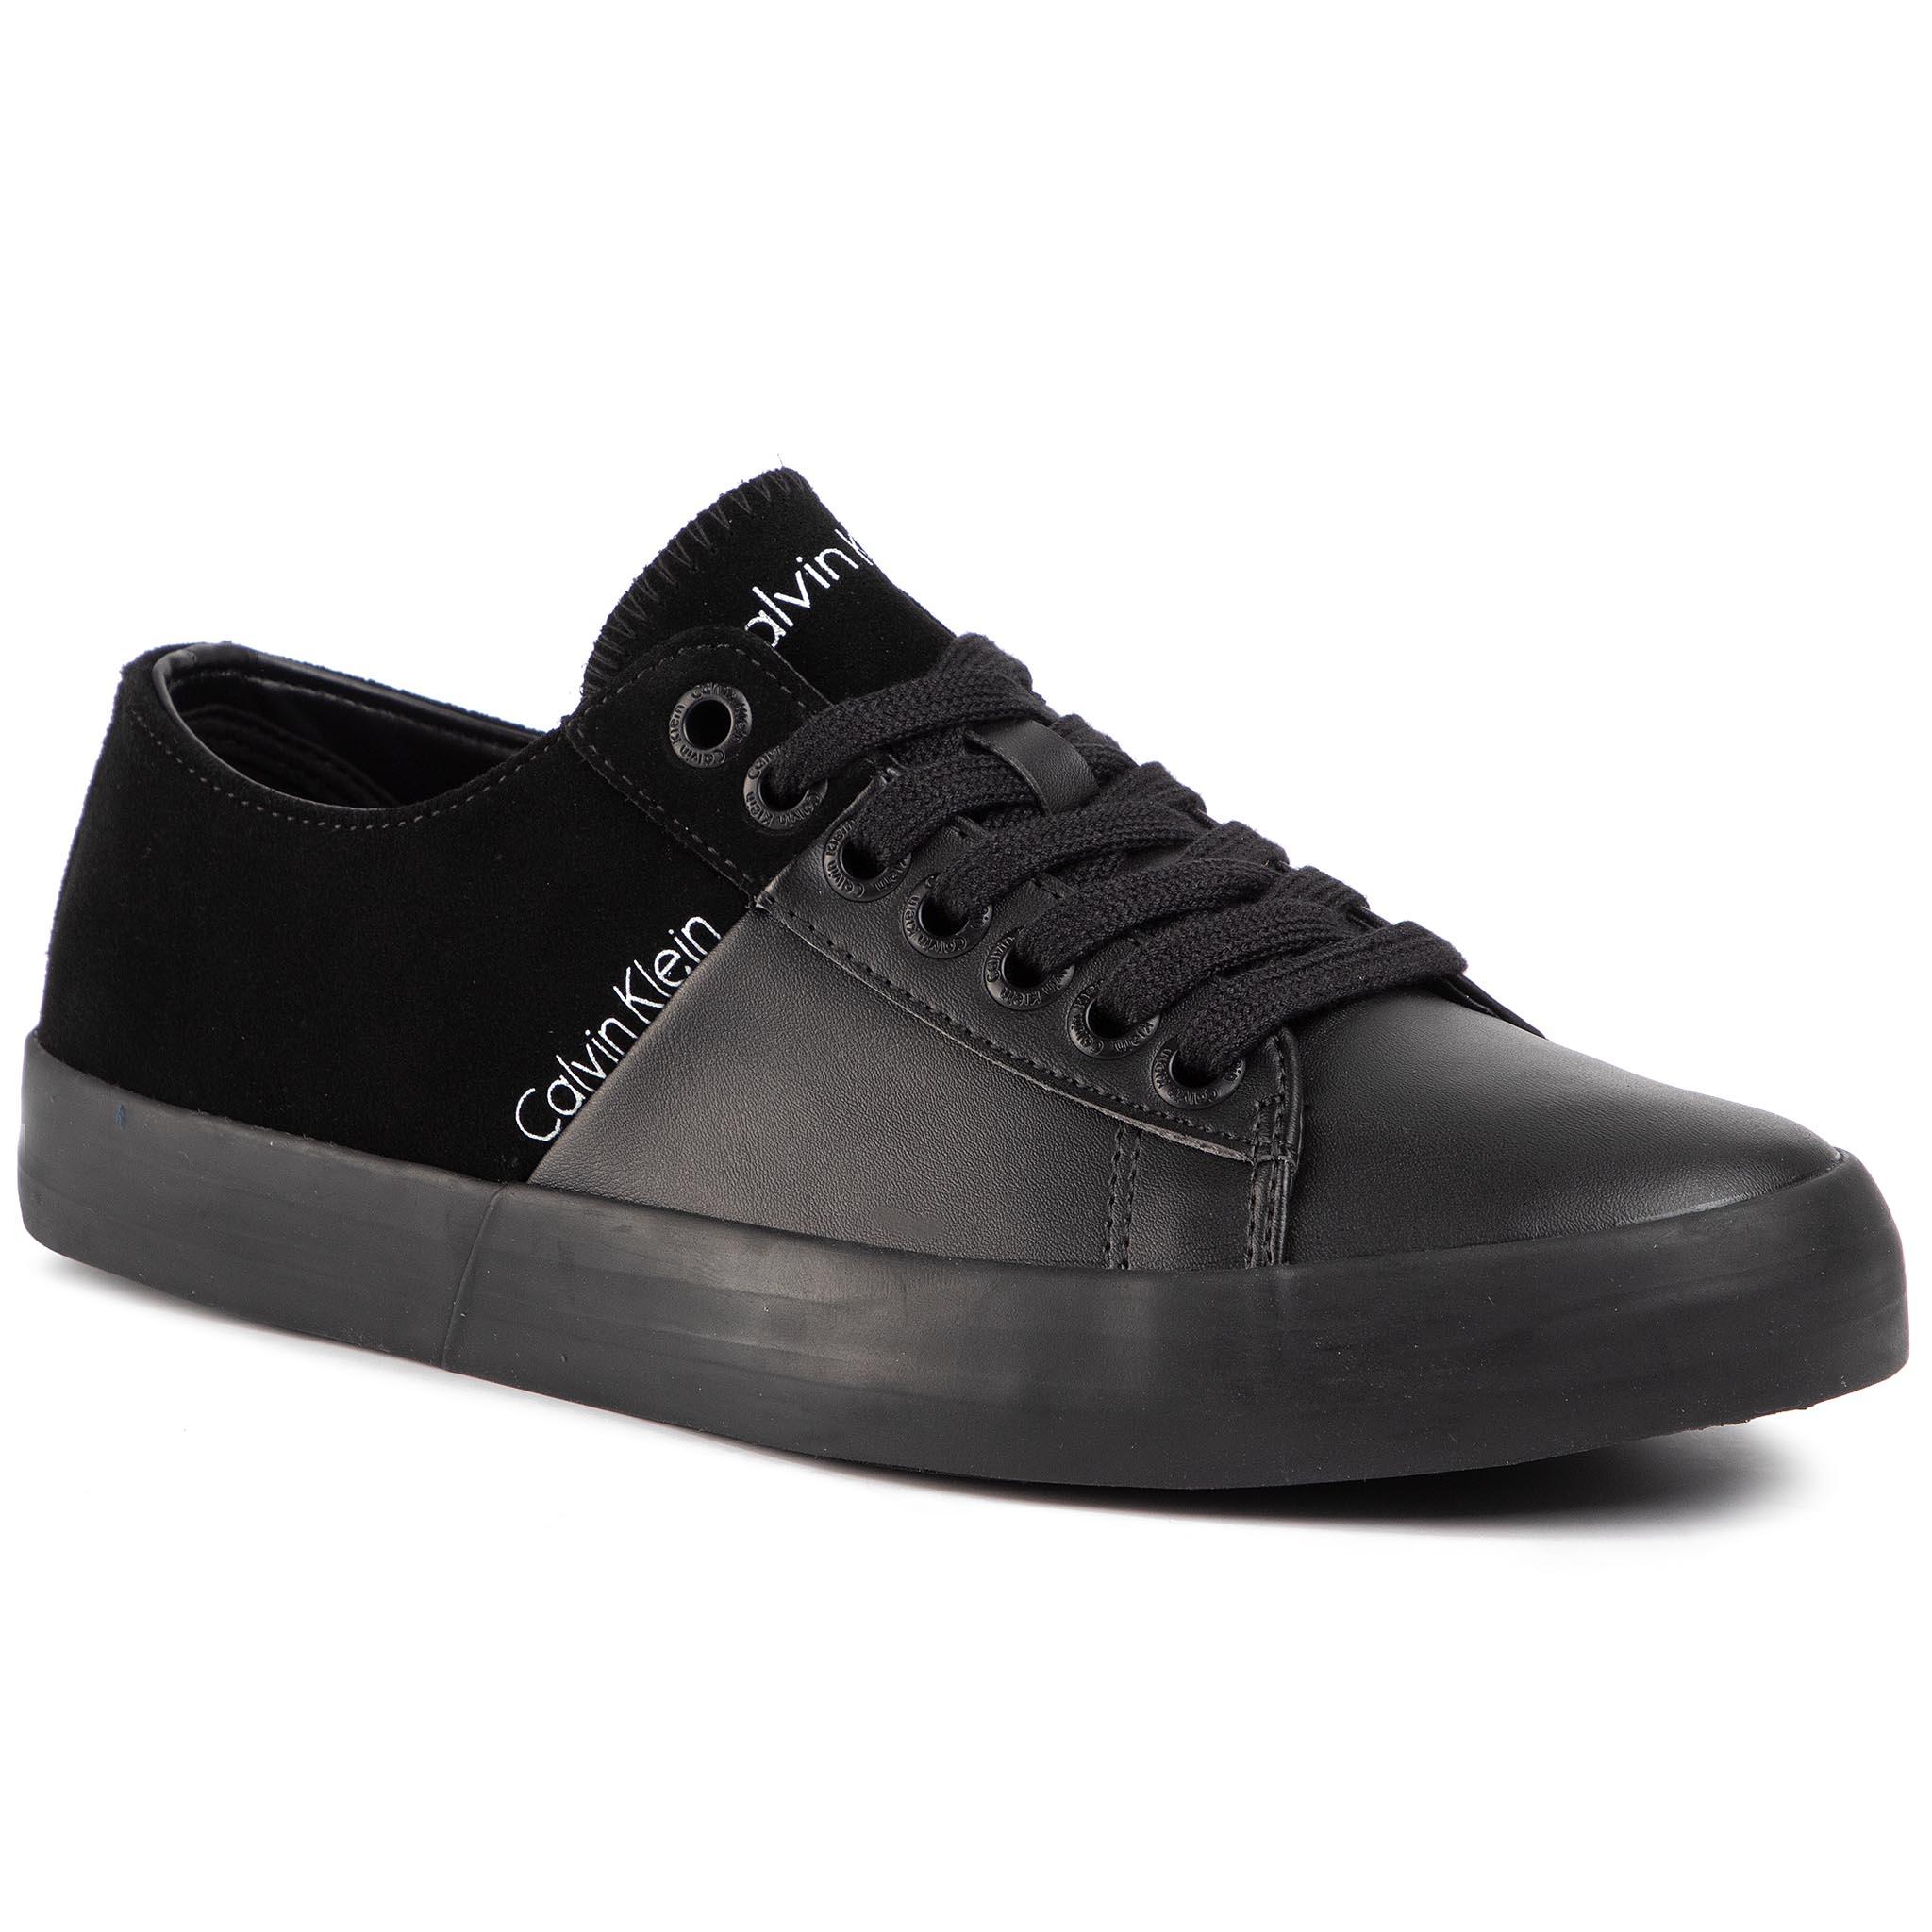 Image of Sneakers CALVIN KLEIN JEANS - Byron SE8461 Black/Black